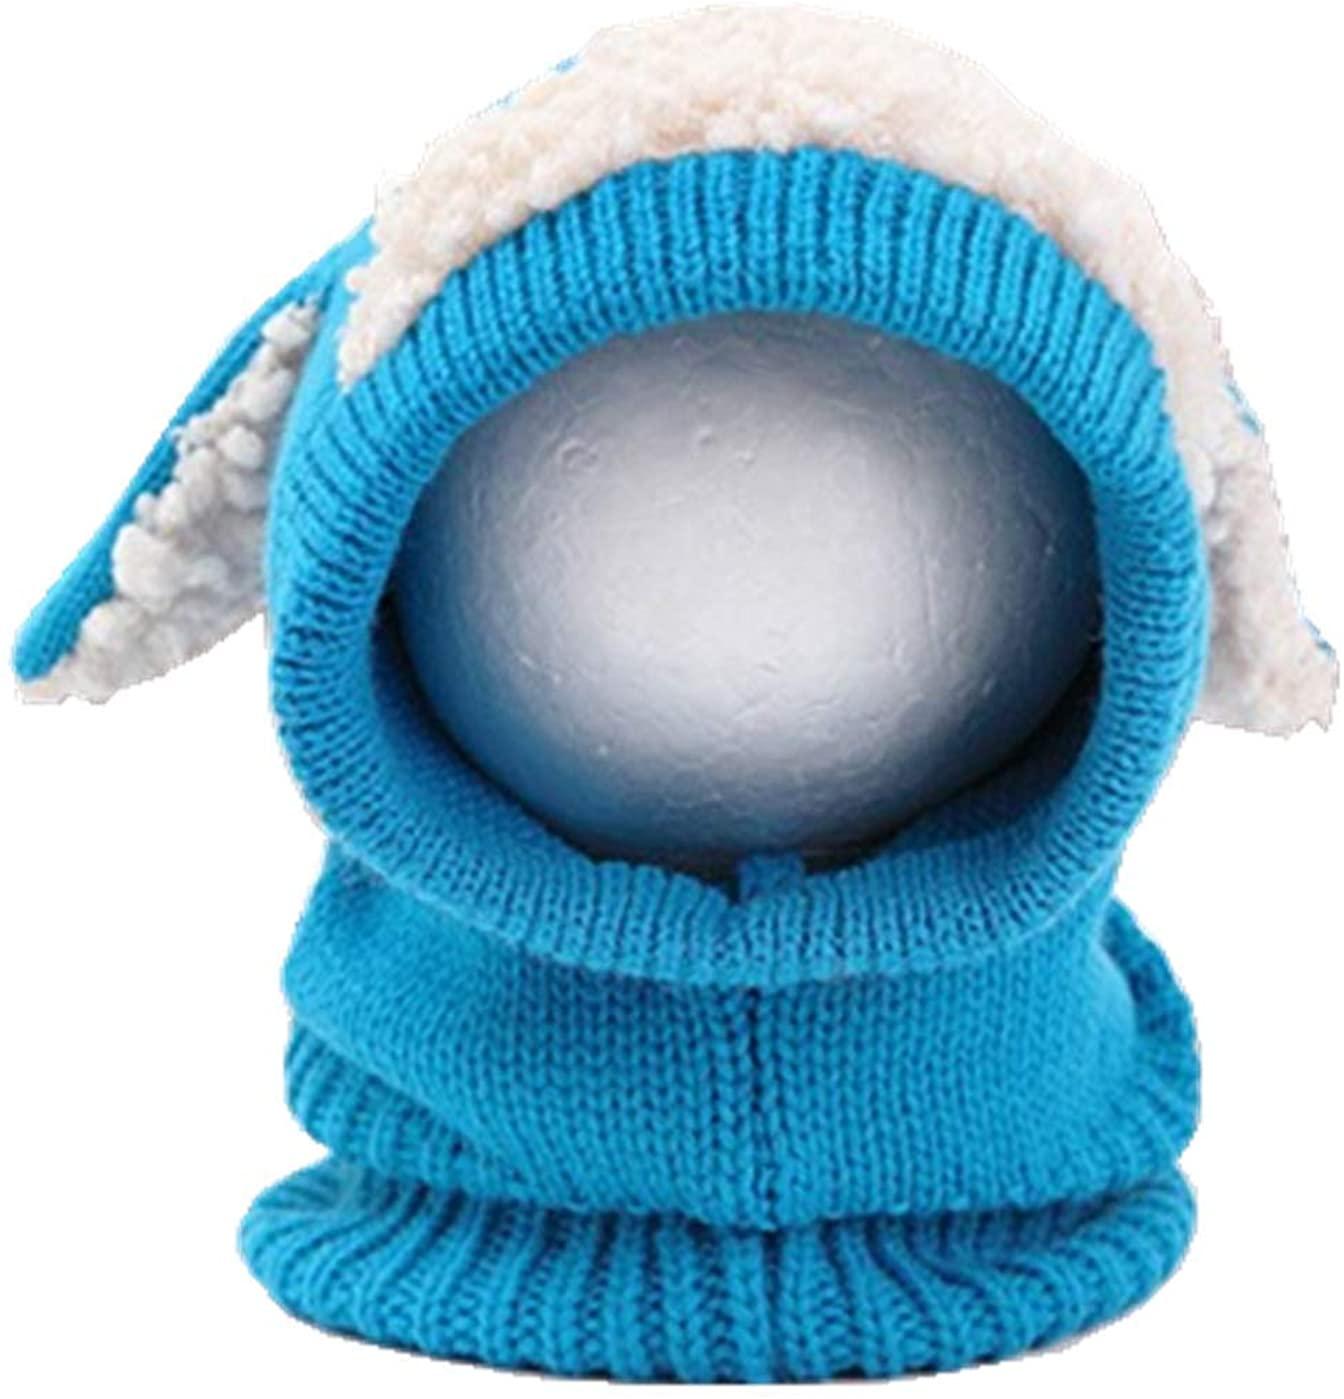 ZffXH Baby Winter Scarf Hat Earflap Hood Skull Cap Stretch Knit Beanie Toddler Sheep